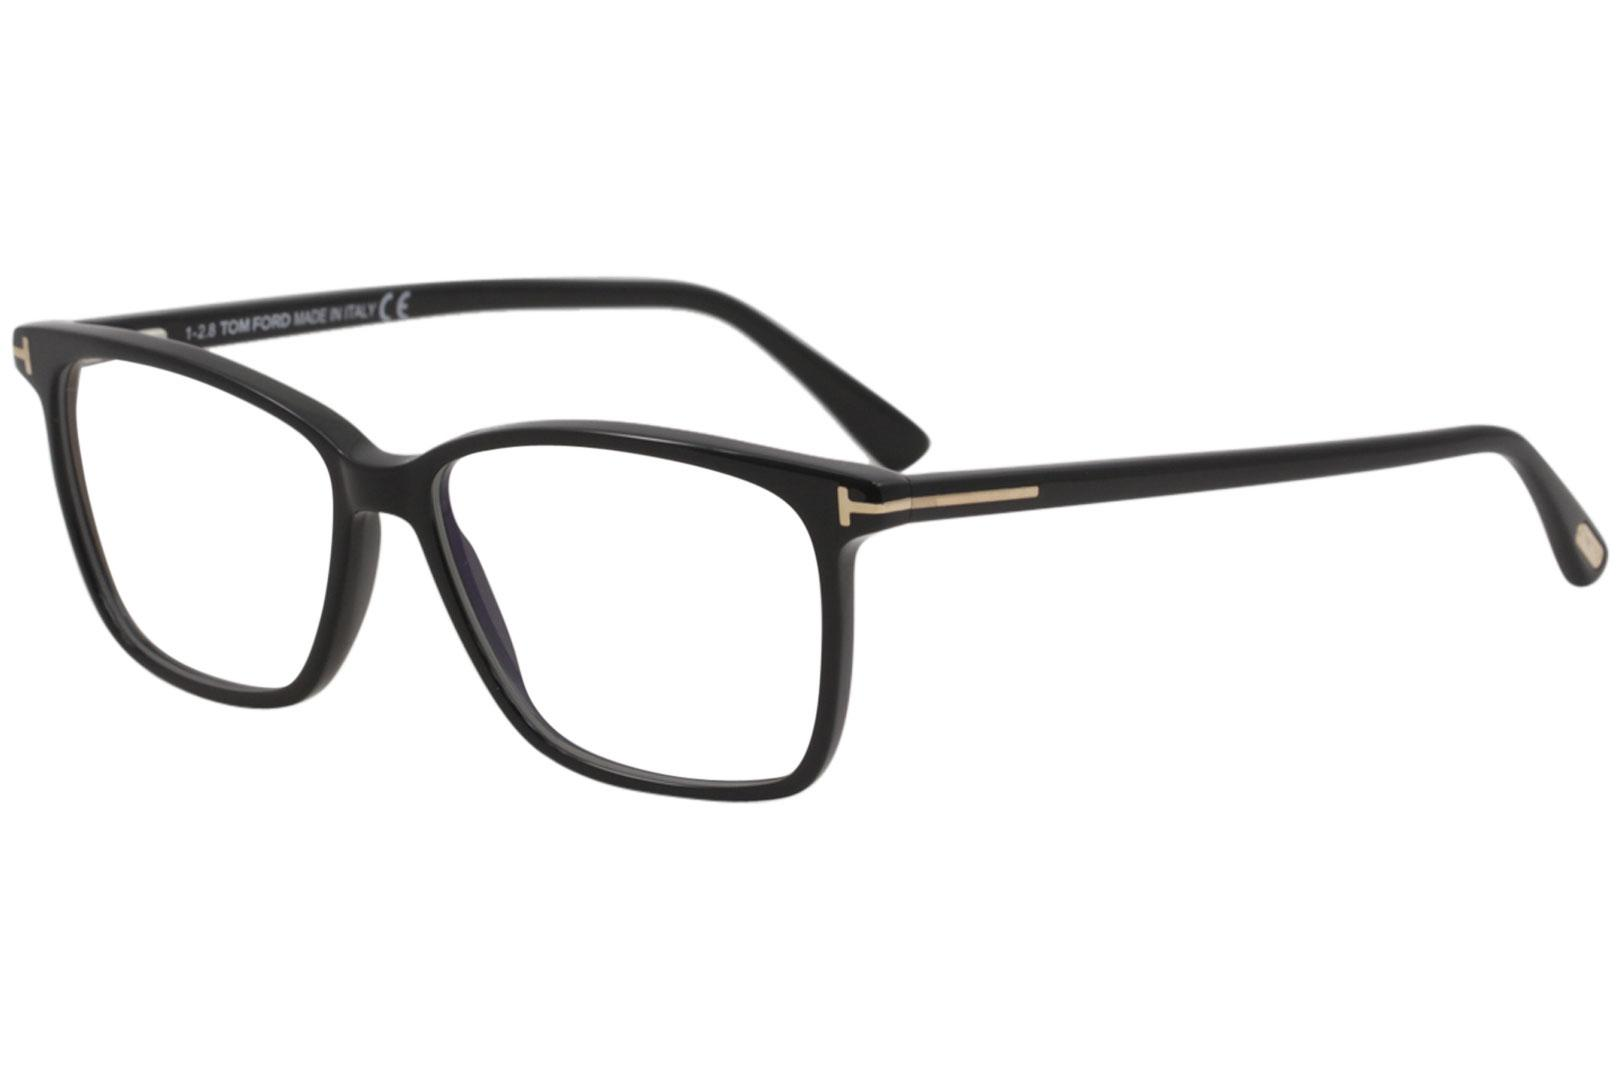 3a4db7f174eb Tom Ford Men s Eyeglasses TF5478-B TF 5478-B Full Rim Optical Frame